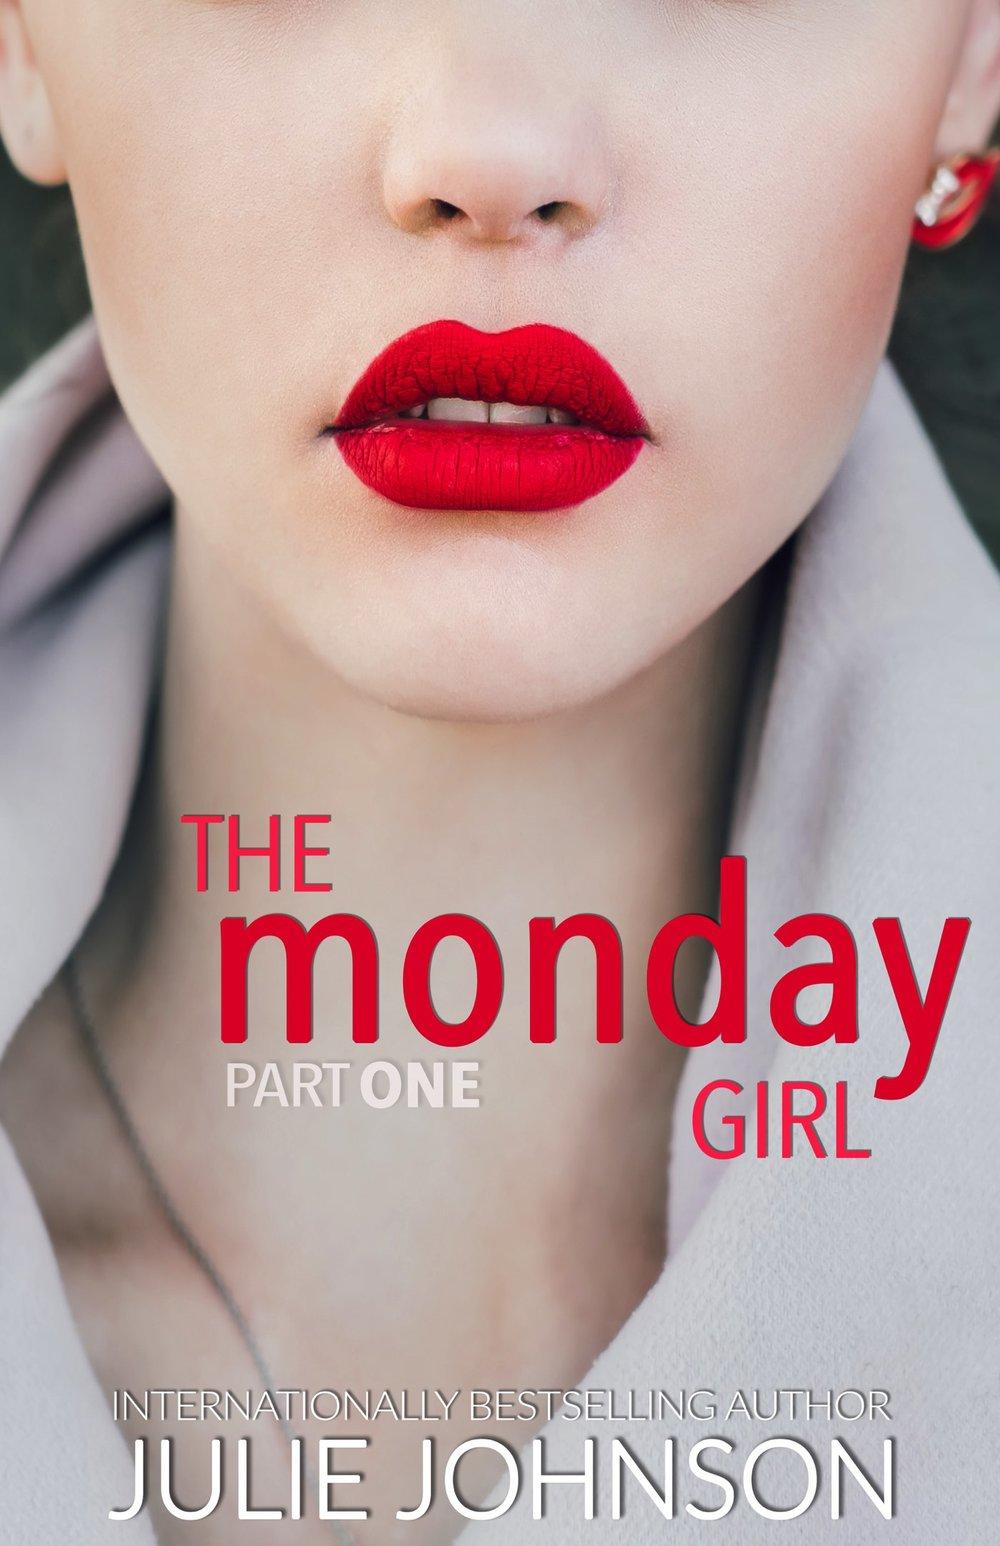 THE-MONDAY-GIRL-Generic.jpg